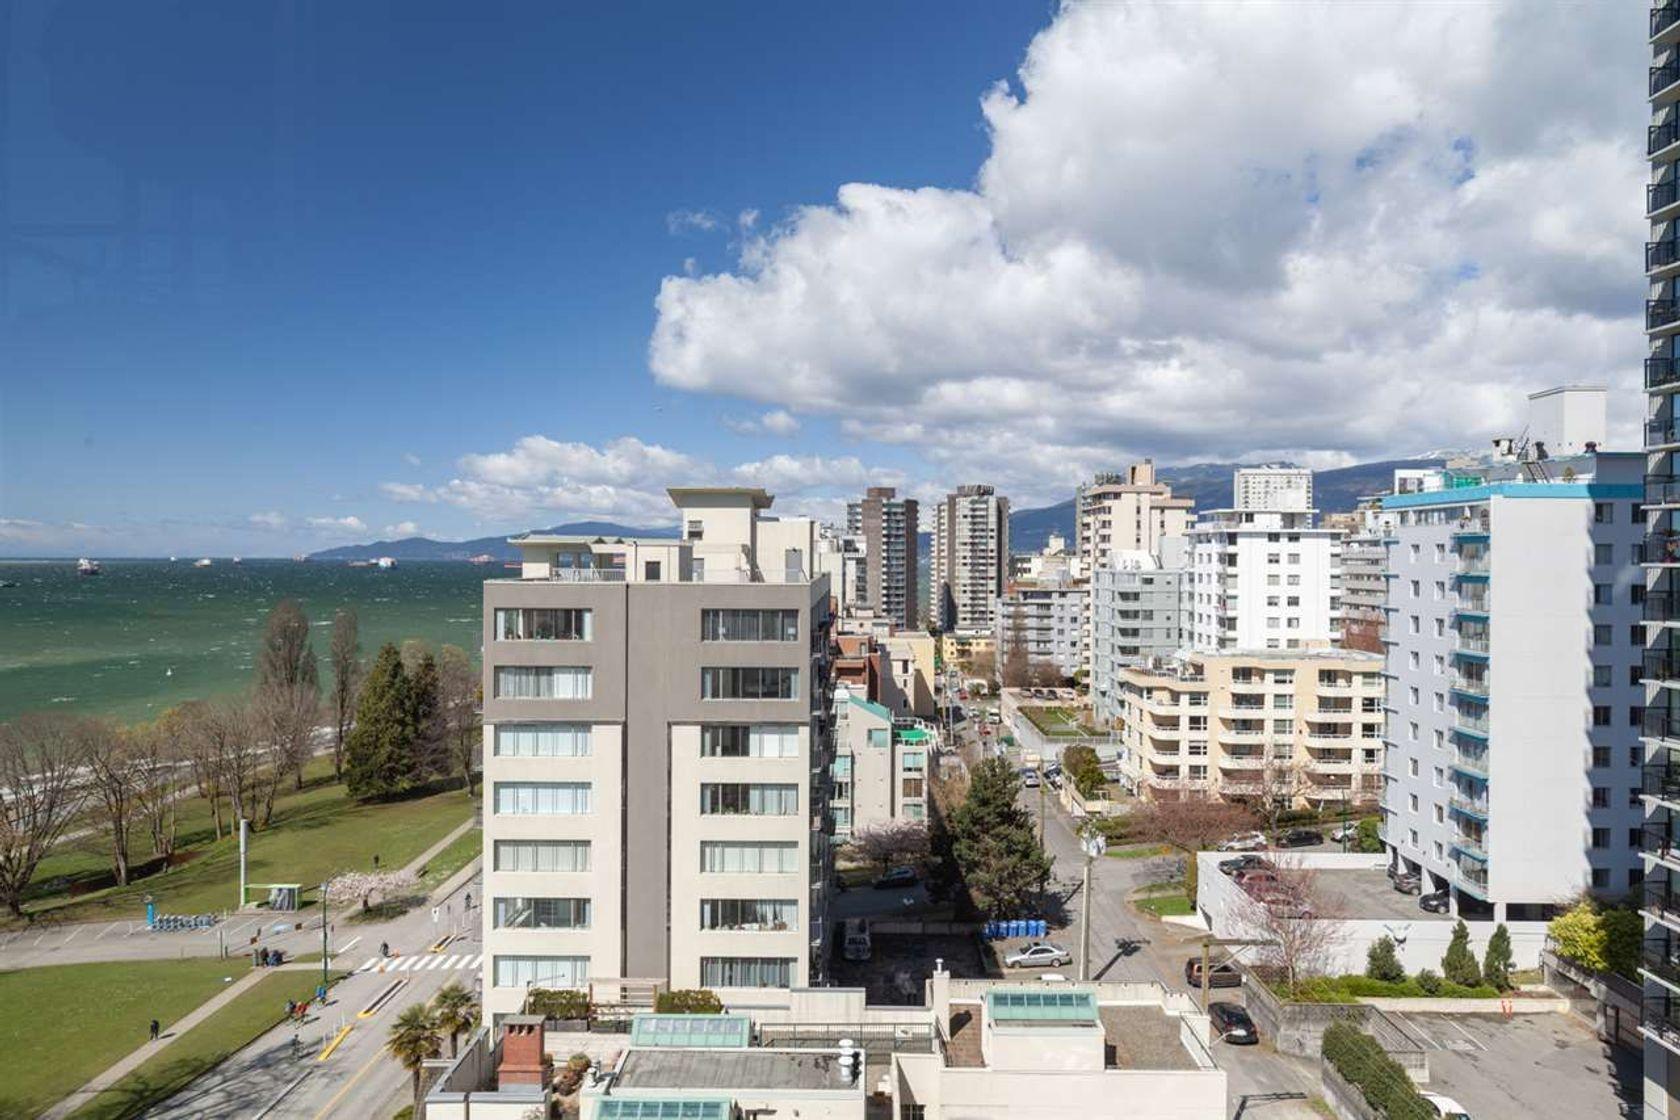 1311-beach-avenue-west-end-vw-vancouver-west-30 at 1103 - 1311 Beach Avenue, Sunset Beach (West End VW), Vancouver West